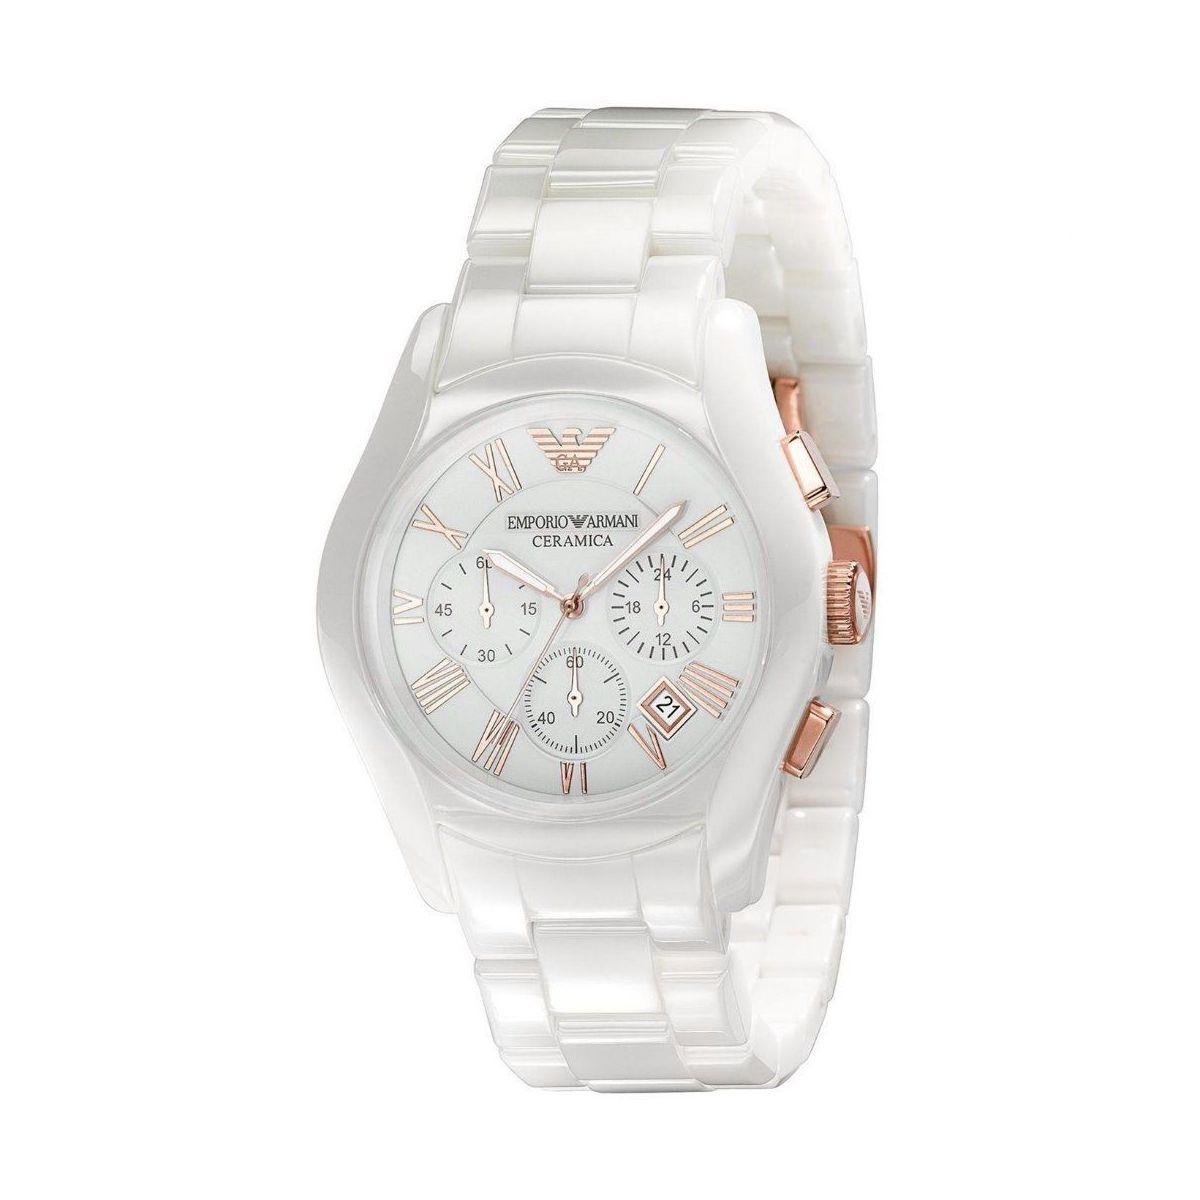 Marvel Endure Improve  Orologio Cronografo Uomo Emporio Armani Watch AR1416